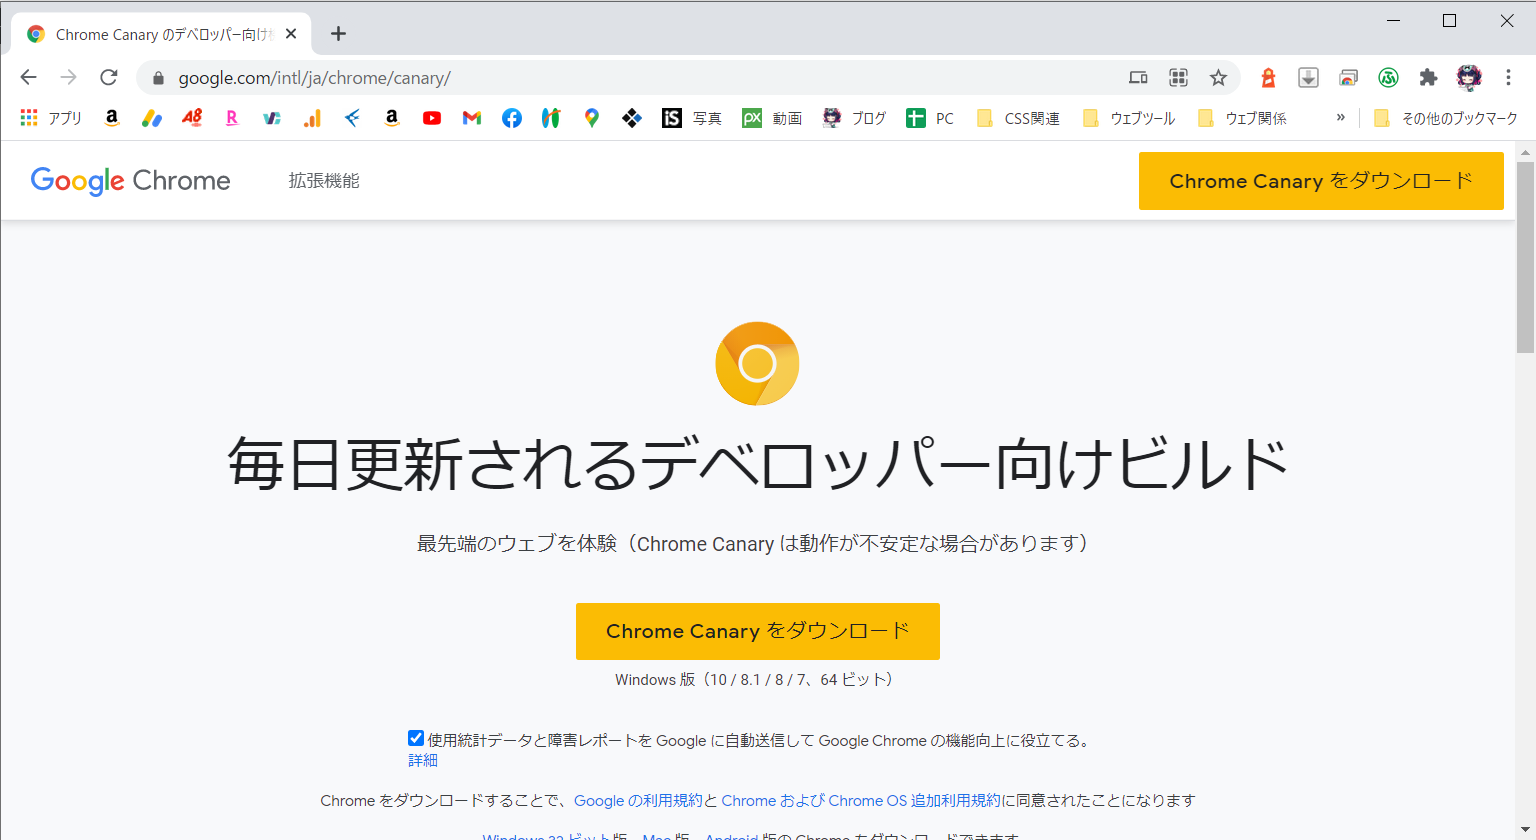 Chromeが重い、動作がおかしい時はChrome Canaryで解決・改善できます【導入方法解説】